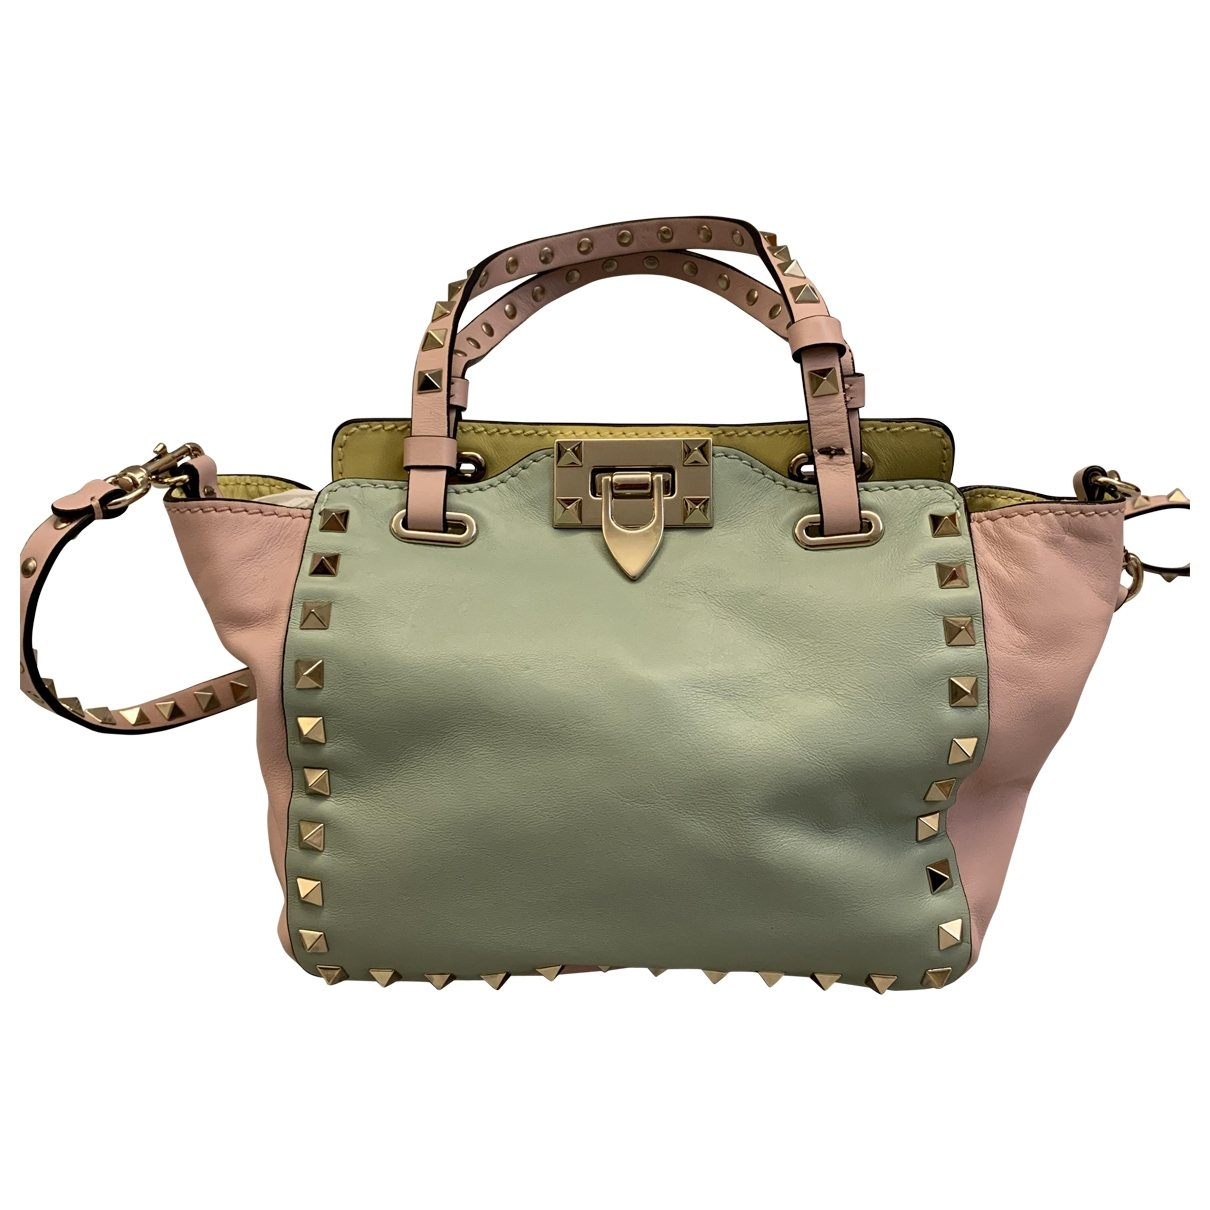 Valentino Garavani Rockstud Multicolour Leather handbag for Women \N